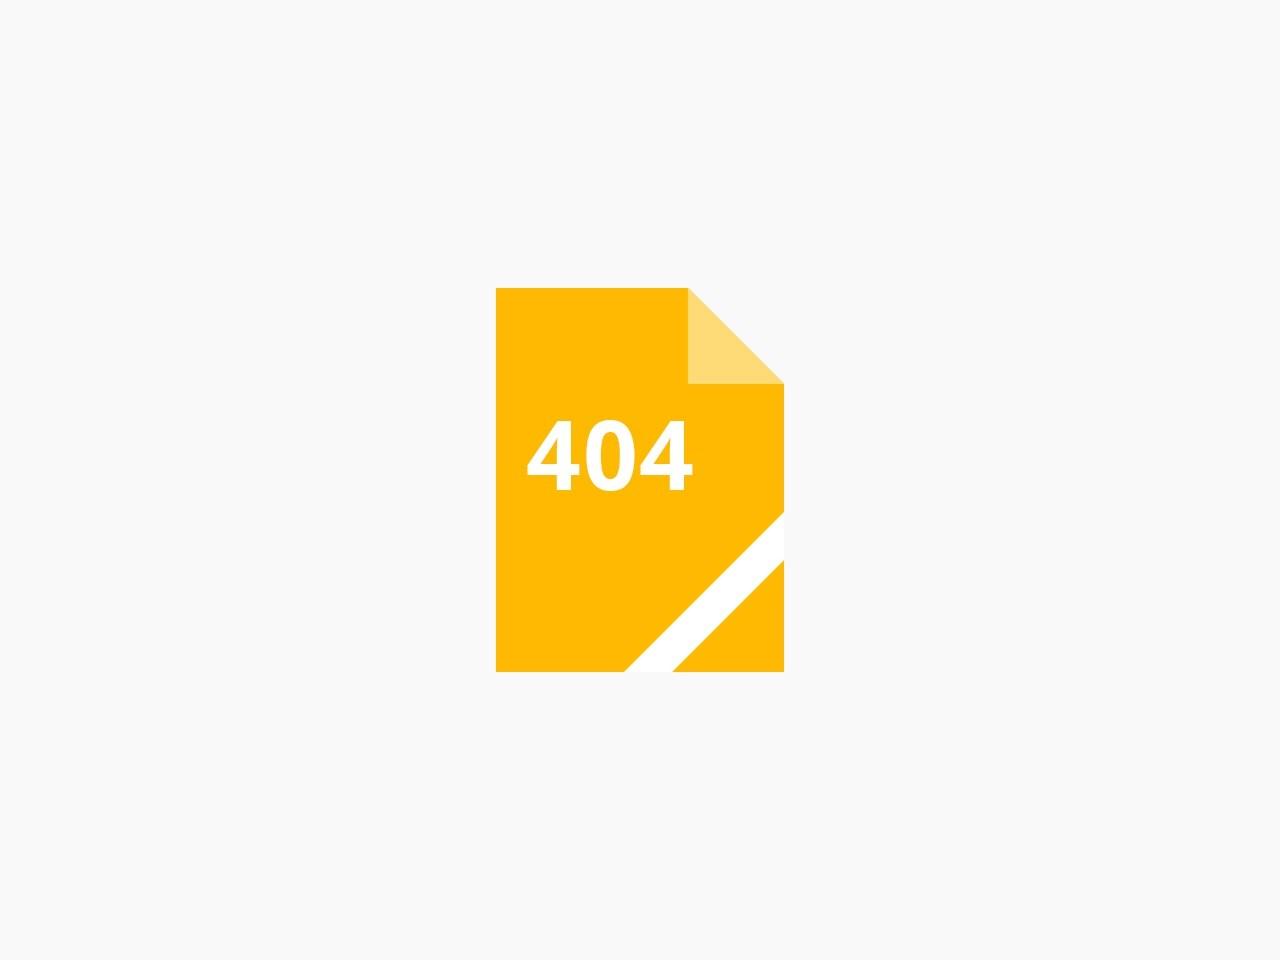 World's Third Richest Insurer AXA Now Accepts Bitcoin Payments in Switzerland